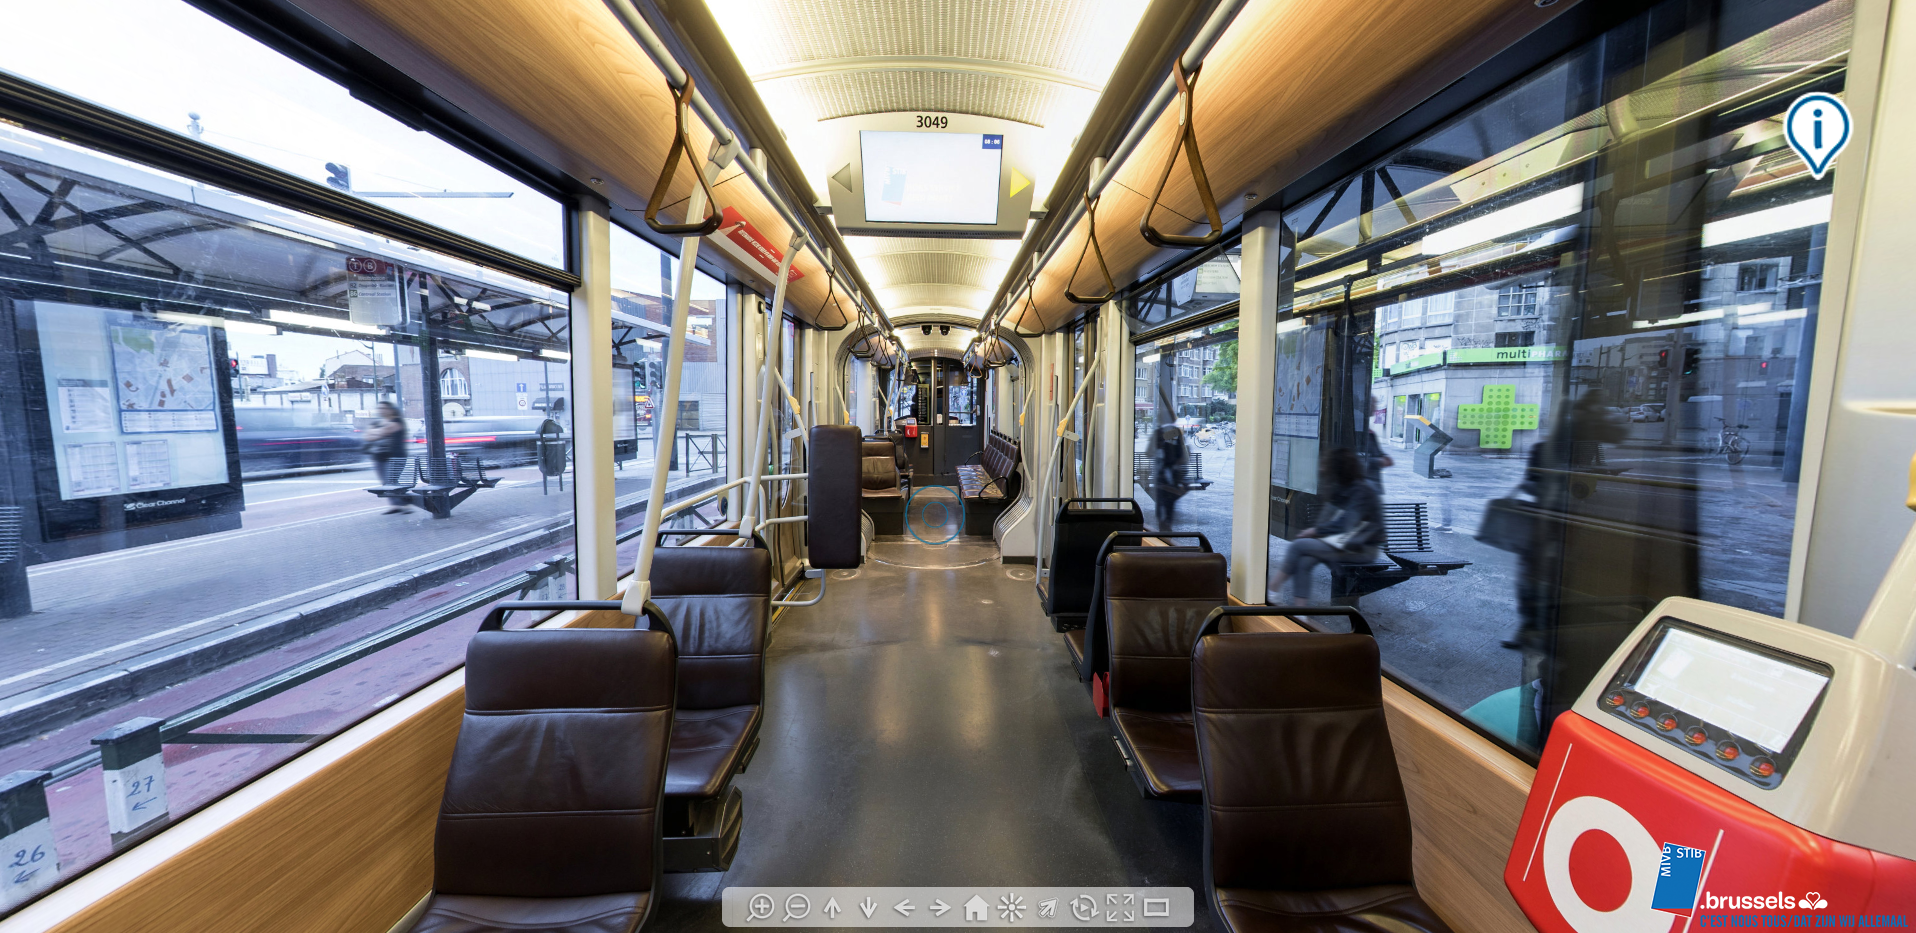 Visite virtuelle tram